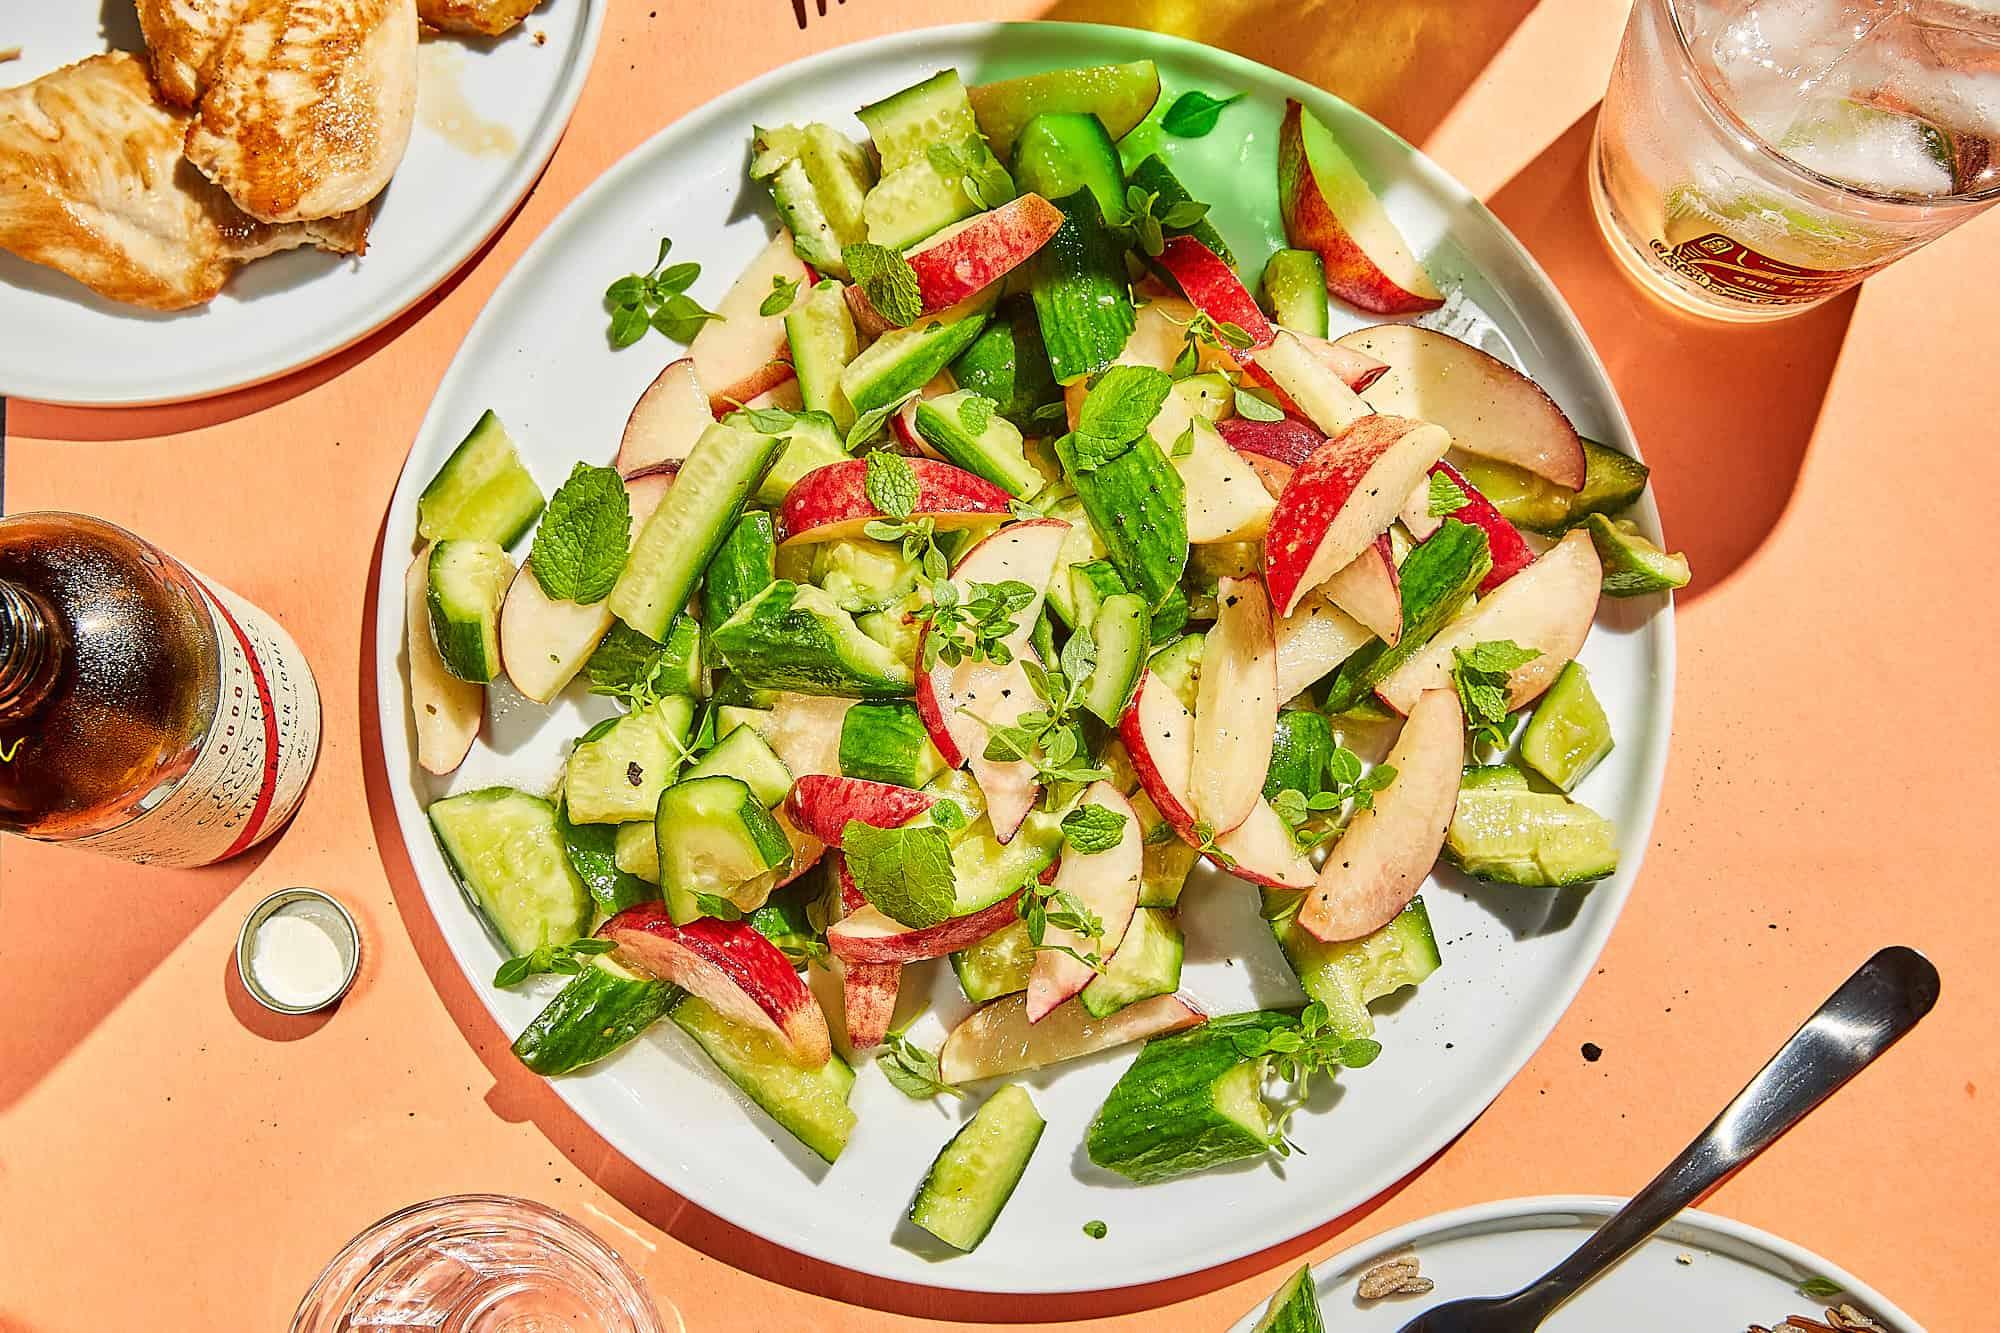 Cucumber and Peach Salad